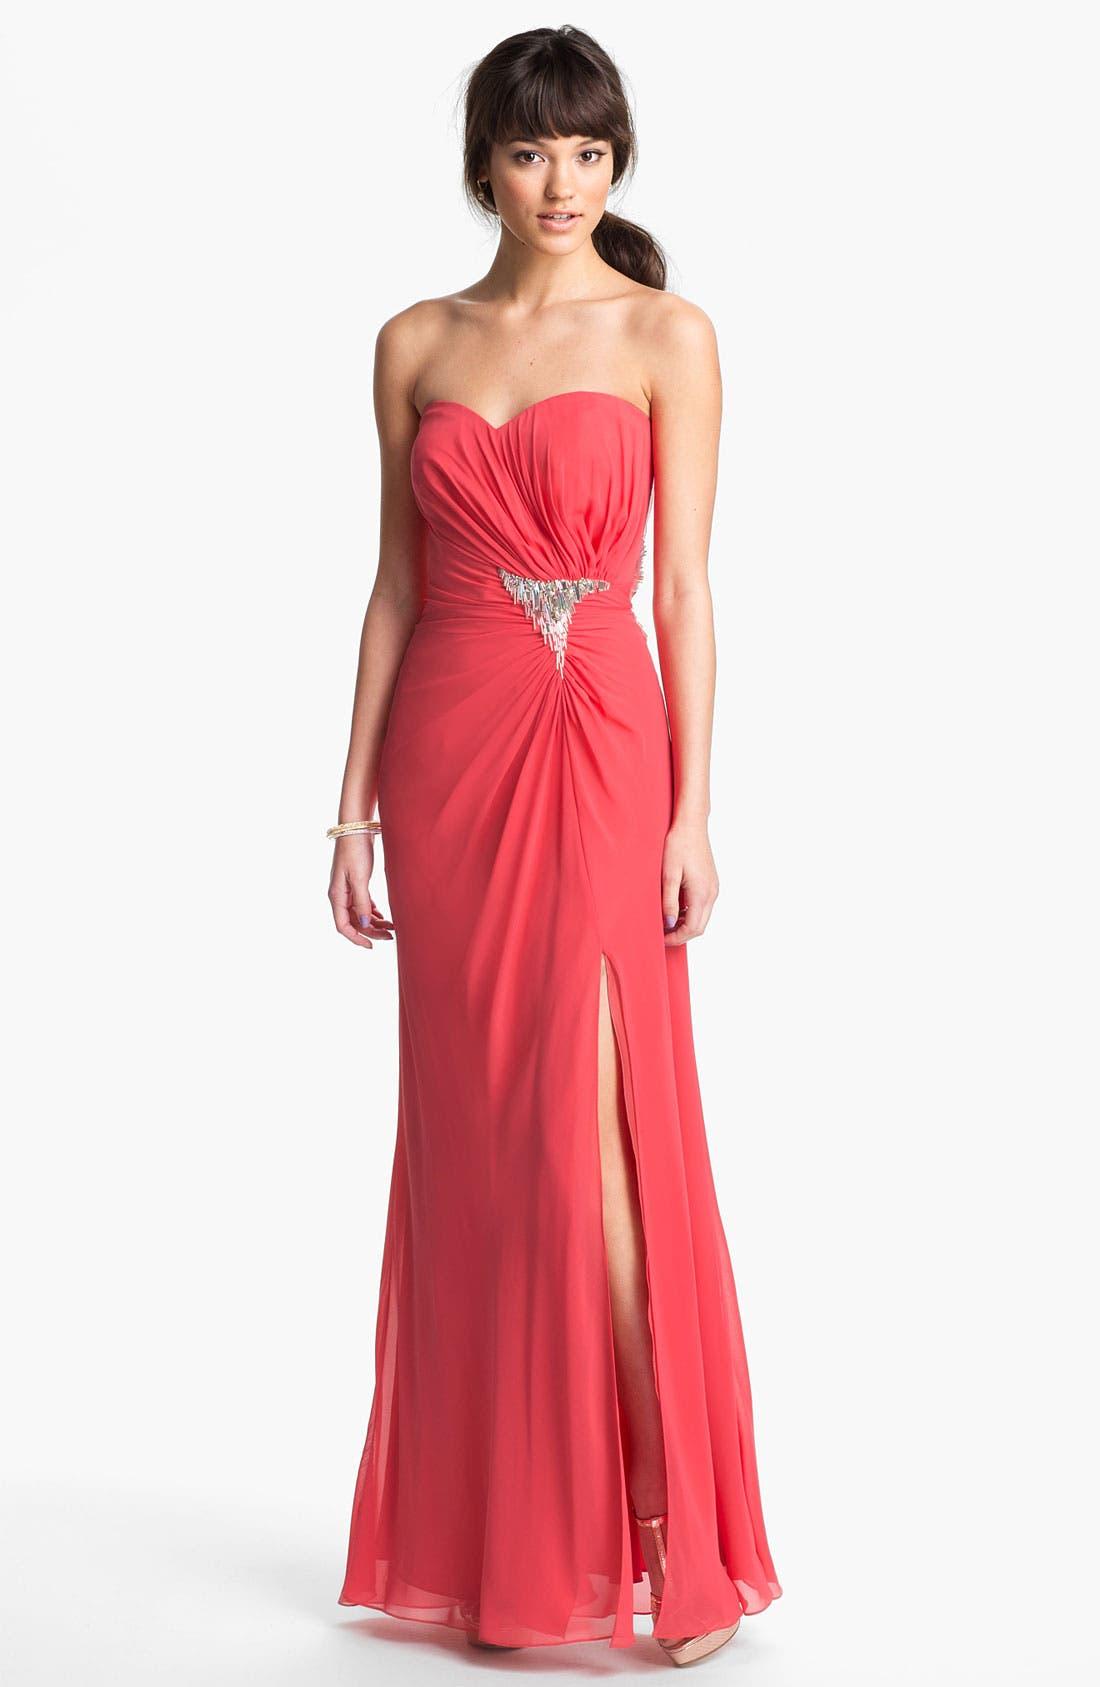 Main Image - Faviana Embellished Strapless Chiffon Gown